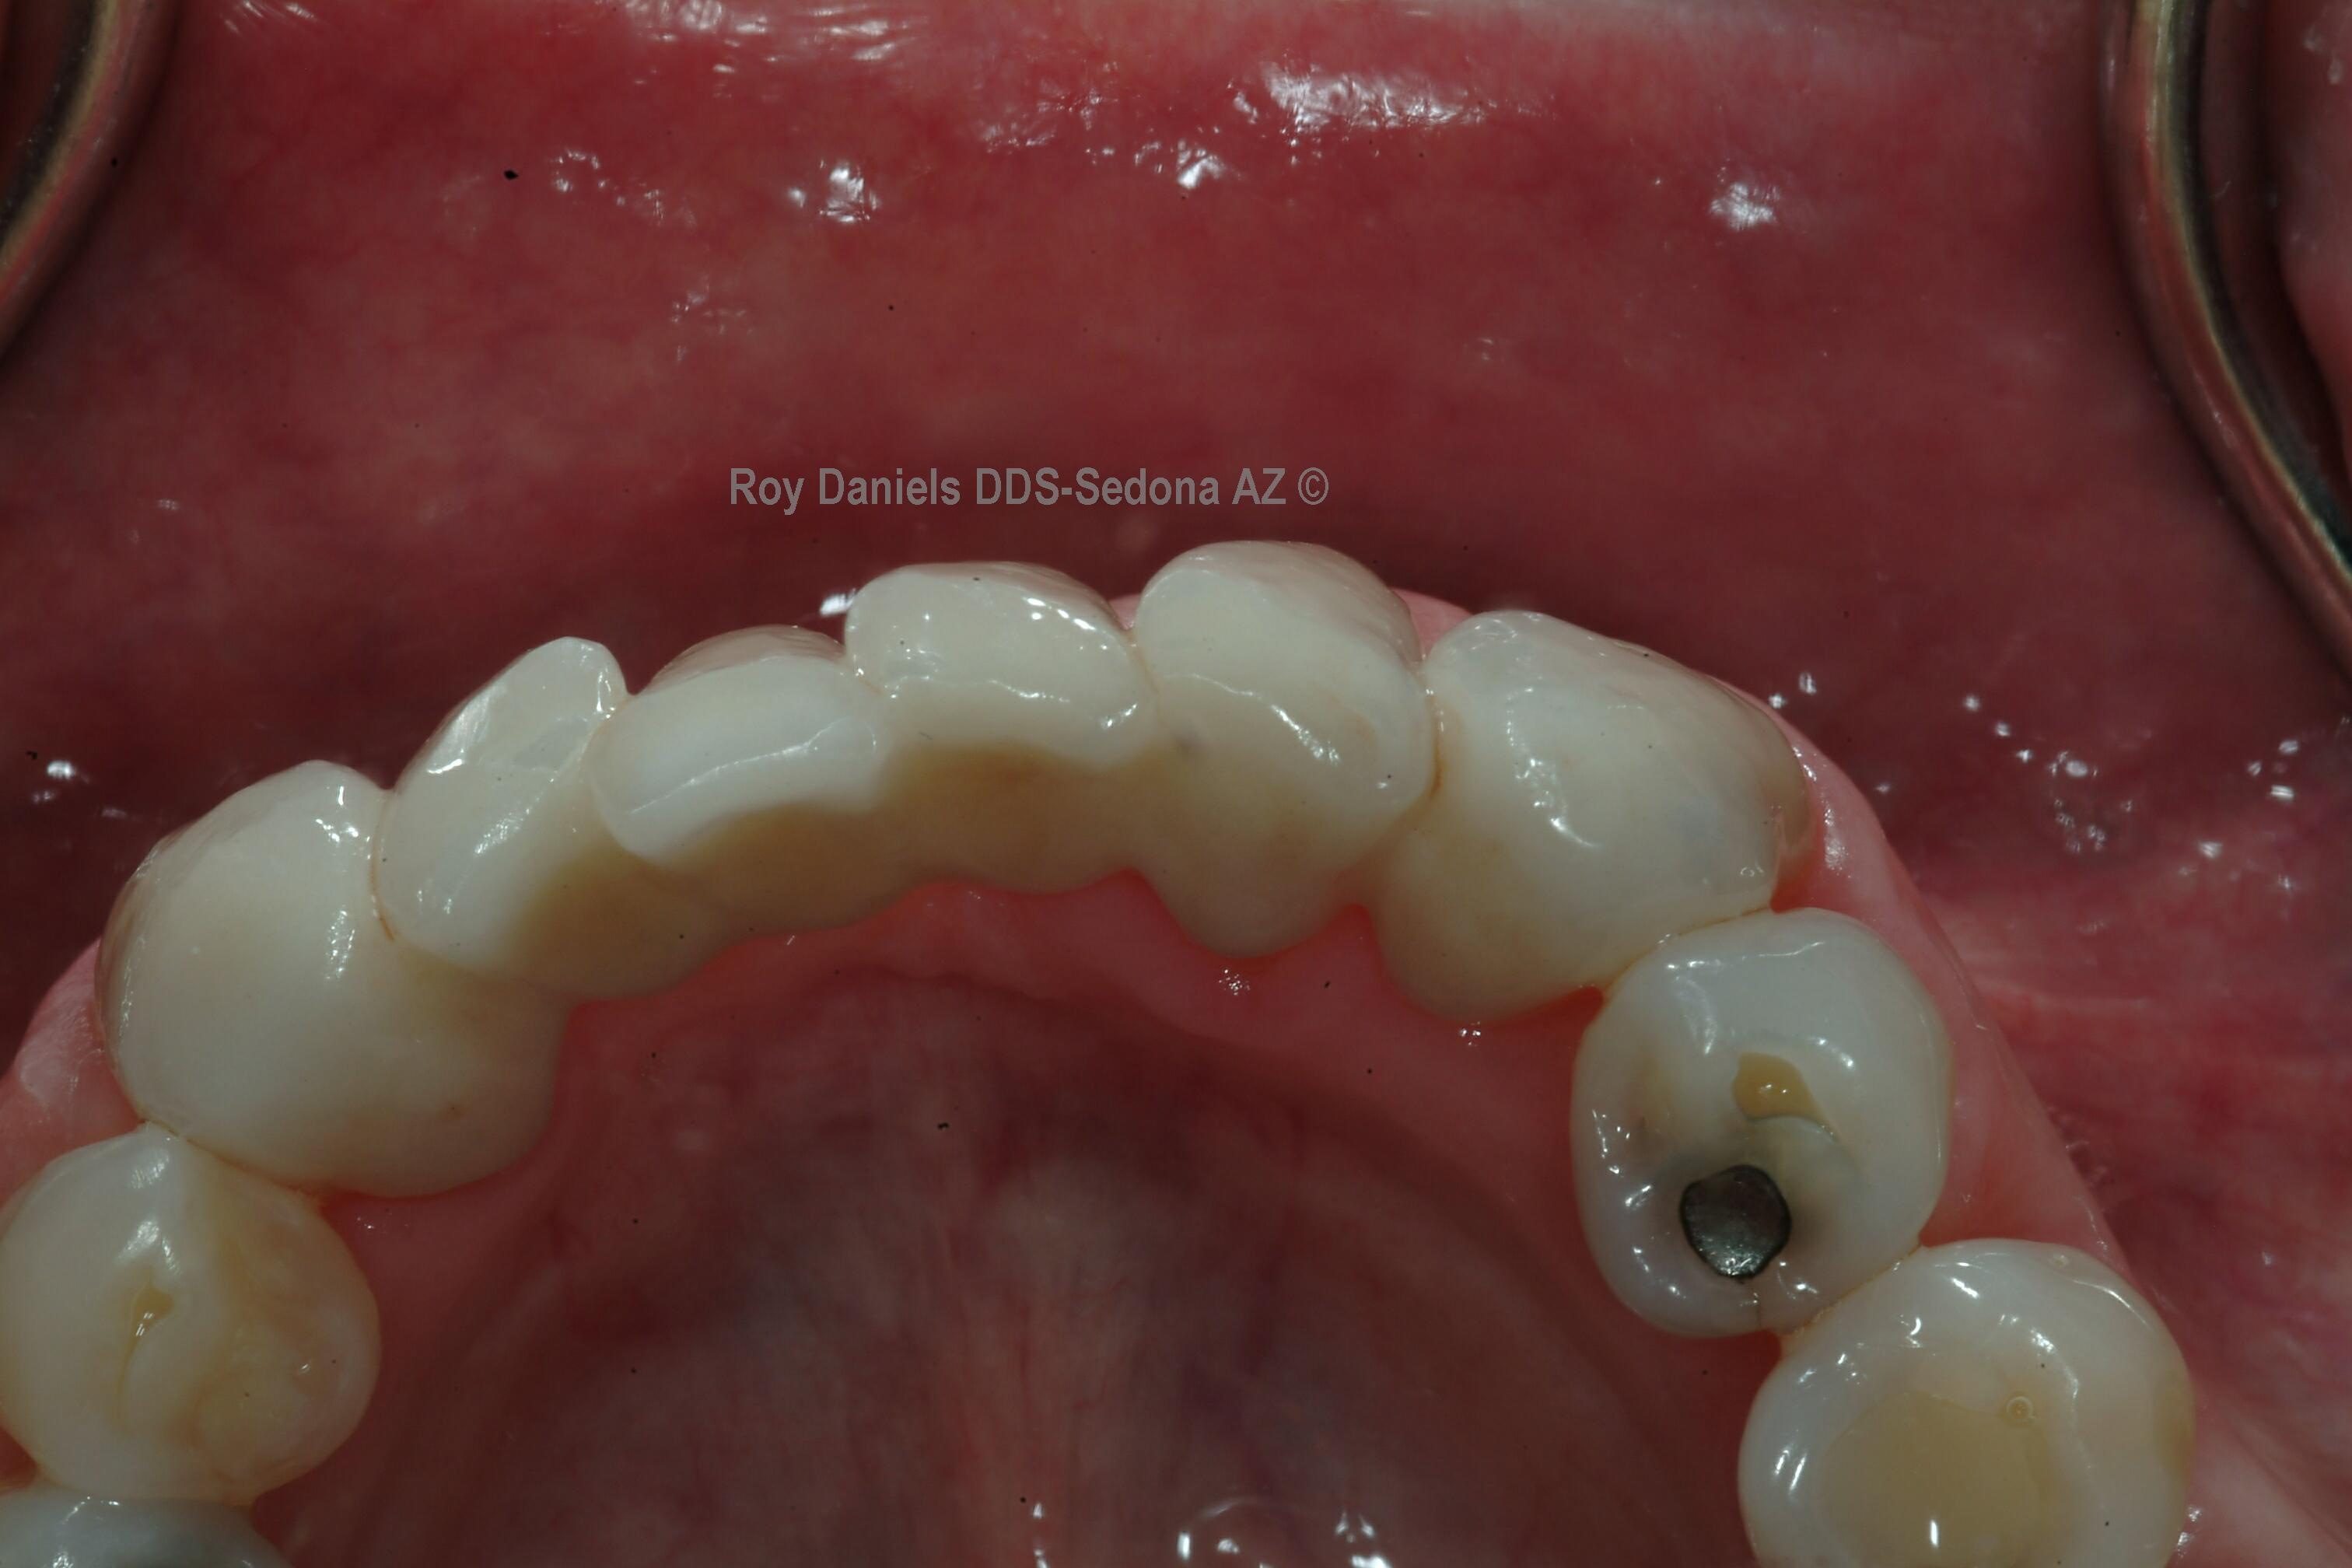 Dental Bridge Replacement - Sedona Arizona Dentist